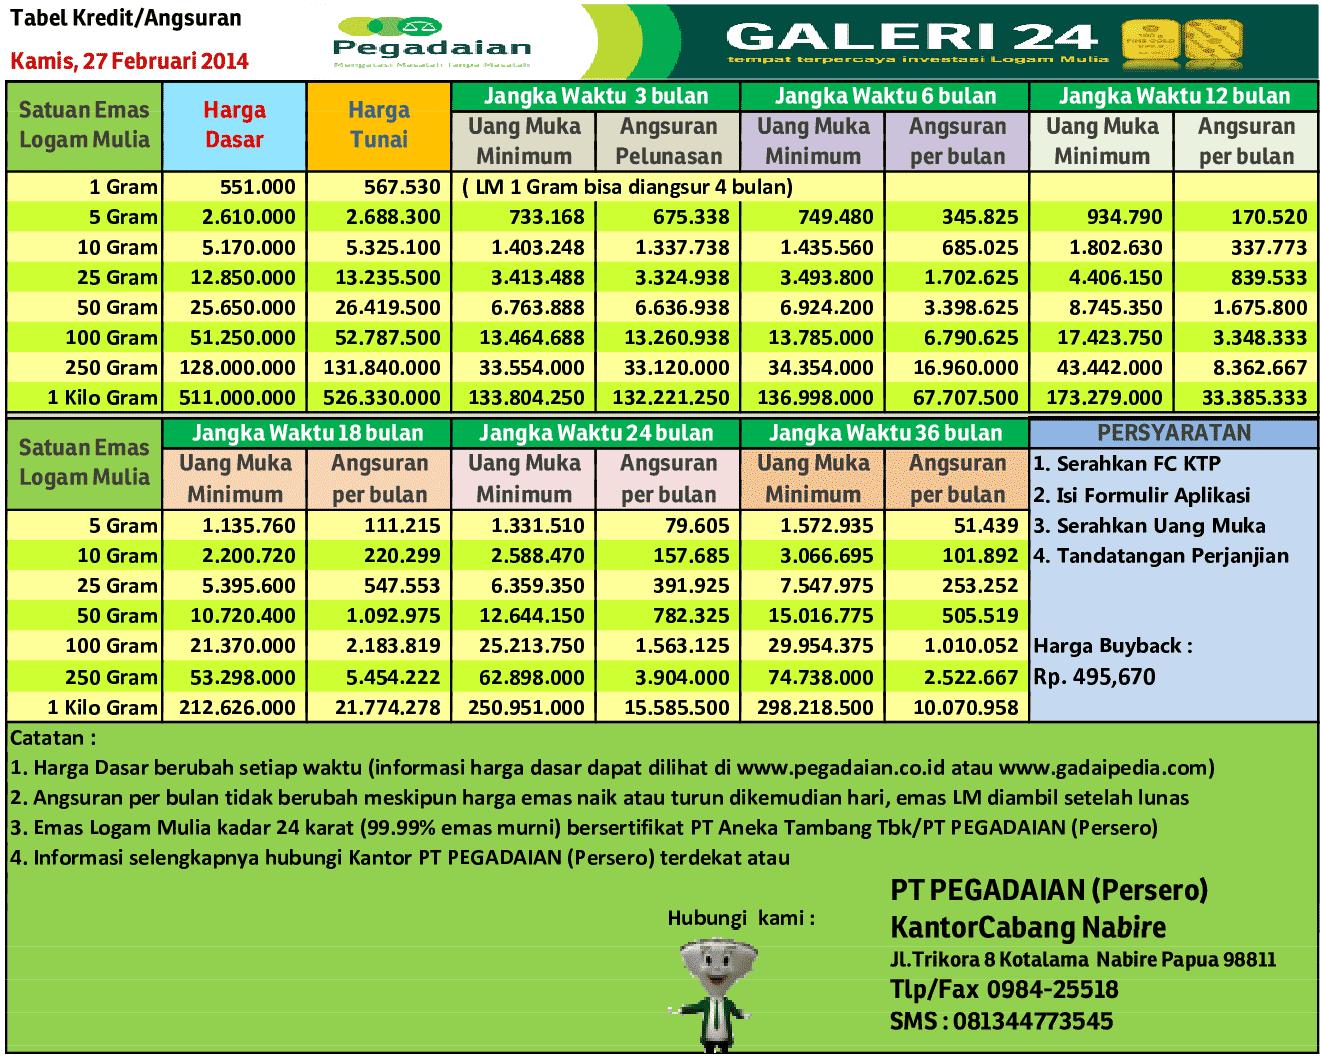 harga emas tabel kredit emas pegadaian 27 februari 2014